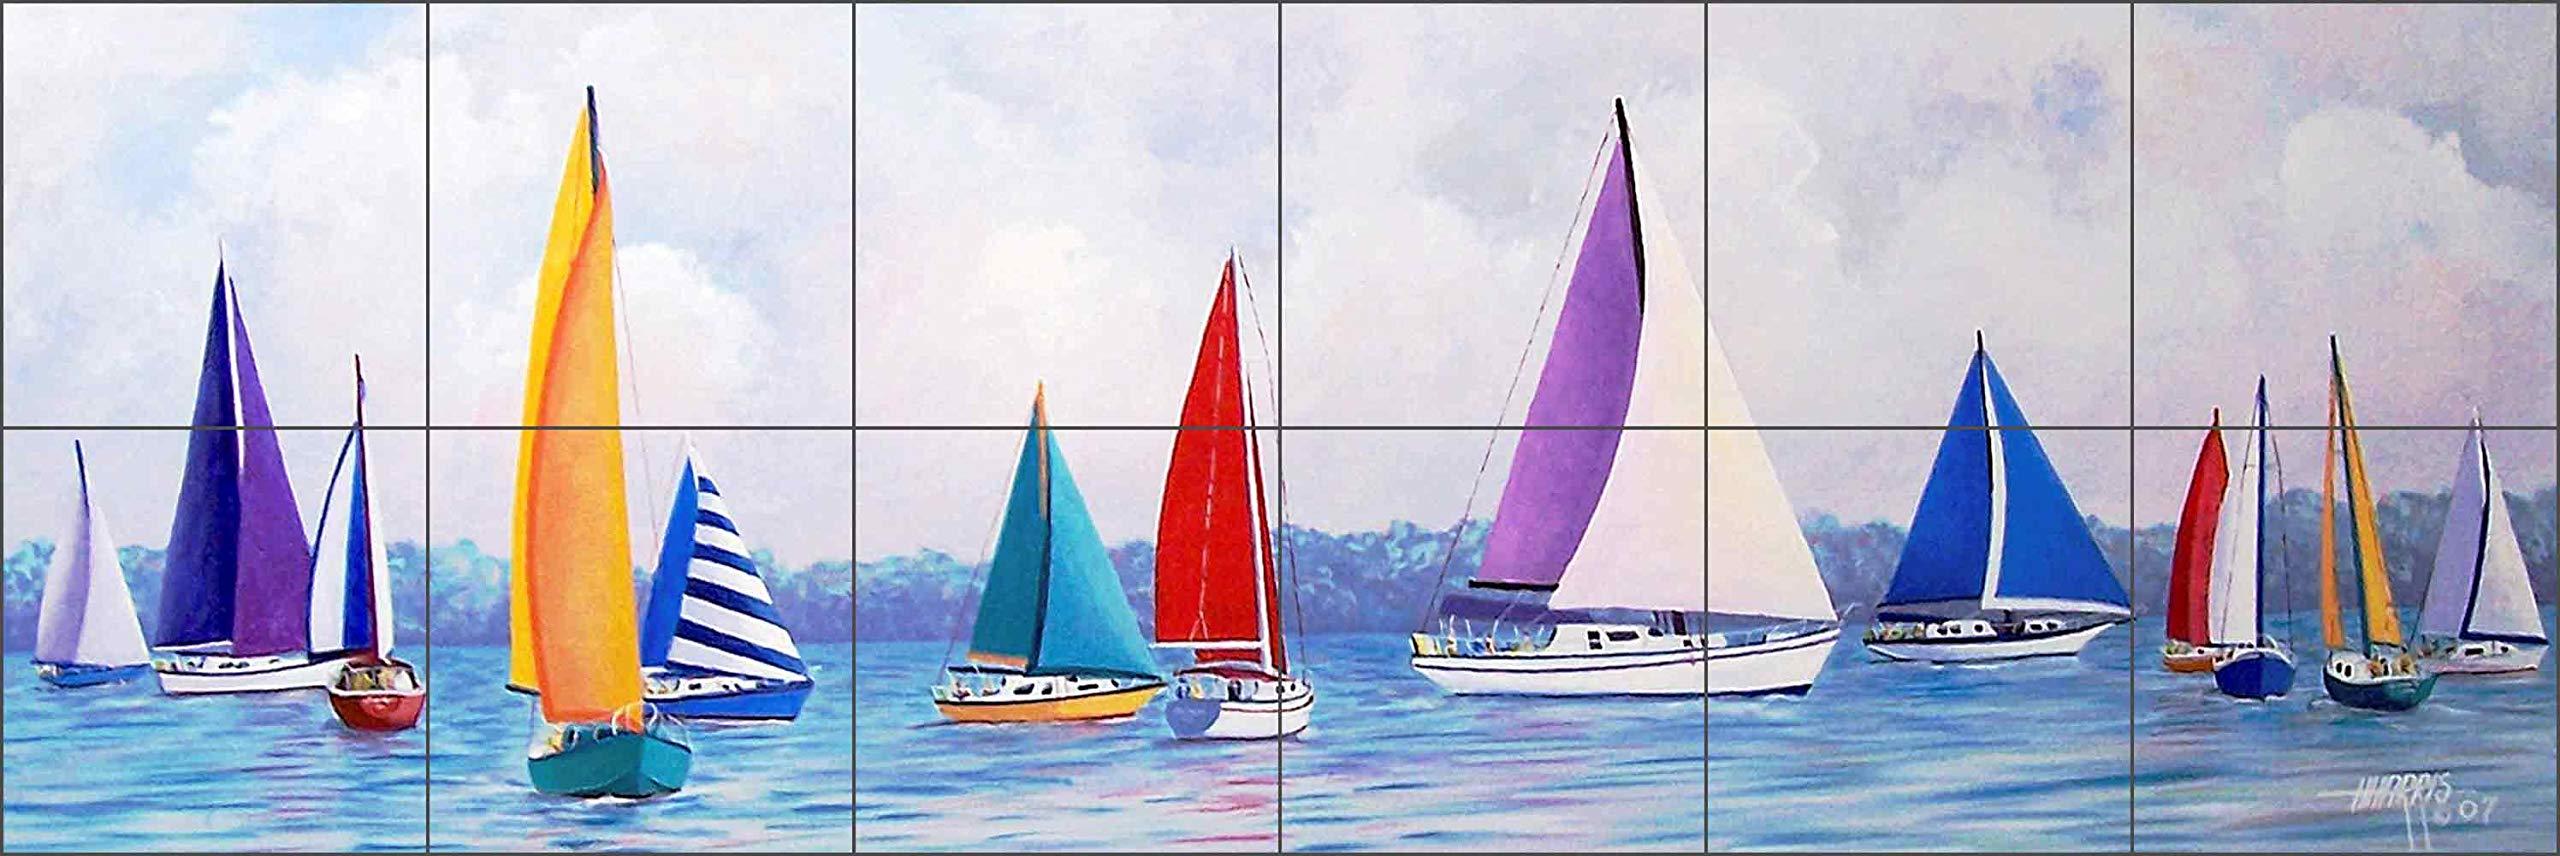 Sailboat Fiesta by Hugh Harris - Nautical Sailboats Ceramic Tile Mural 8.5'' x 25.5'' Kitchen Shower Backsplash